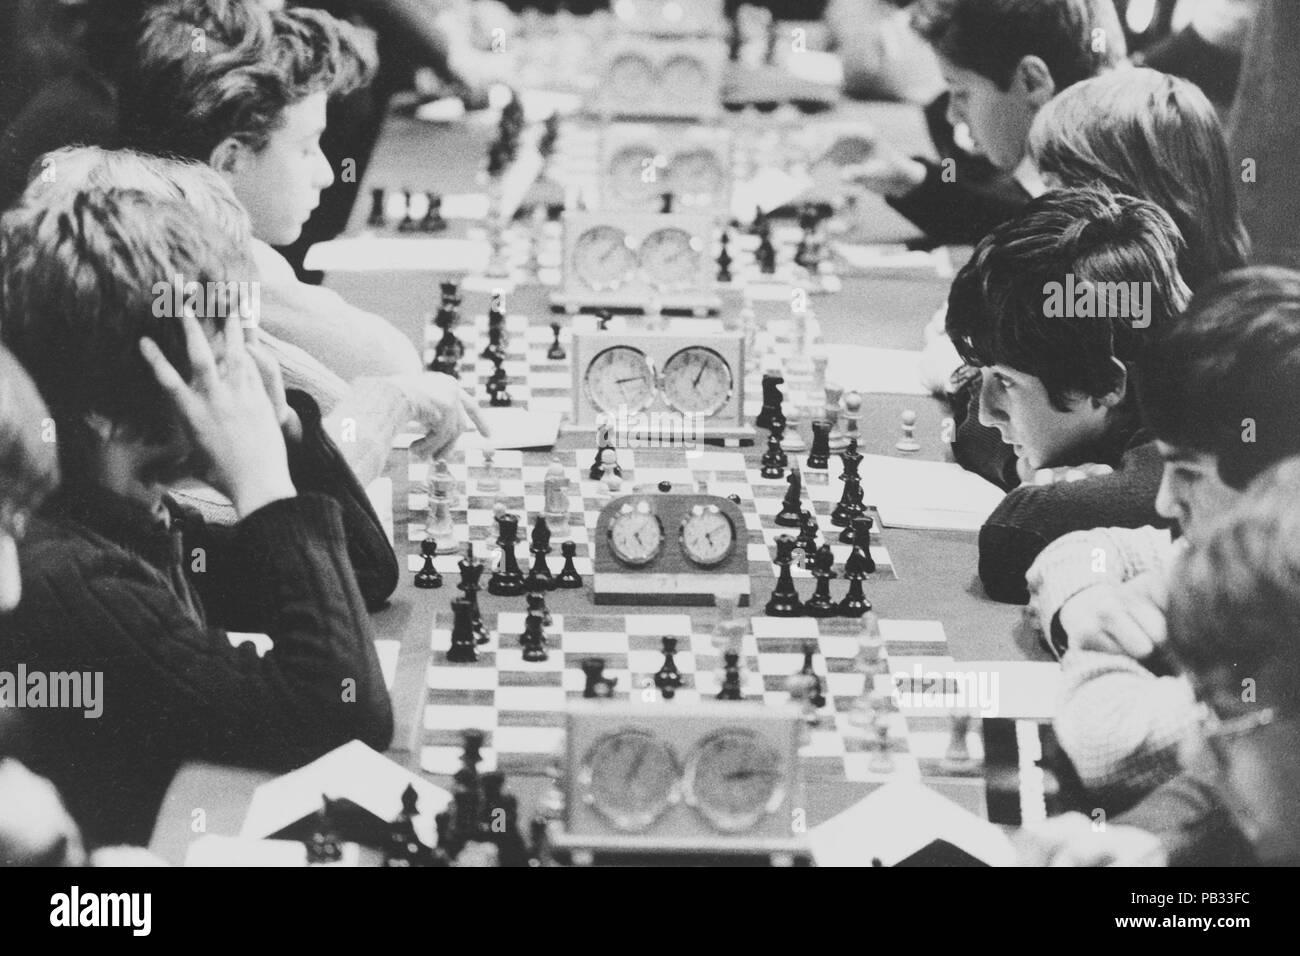 italy, milan, chess tournament for boys, 1973 - Stock Image